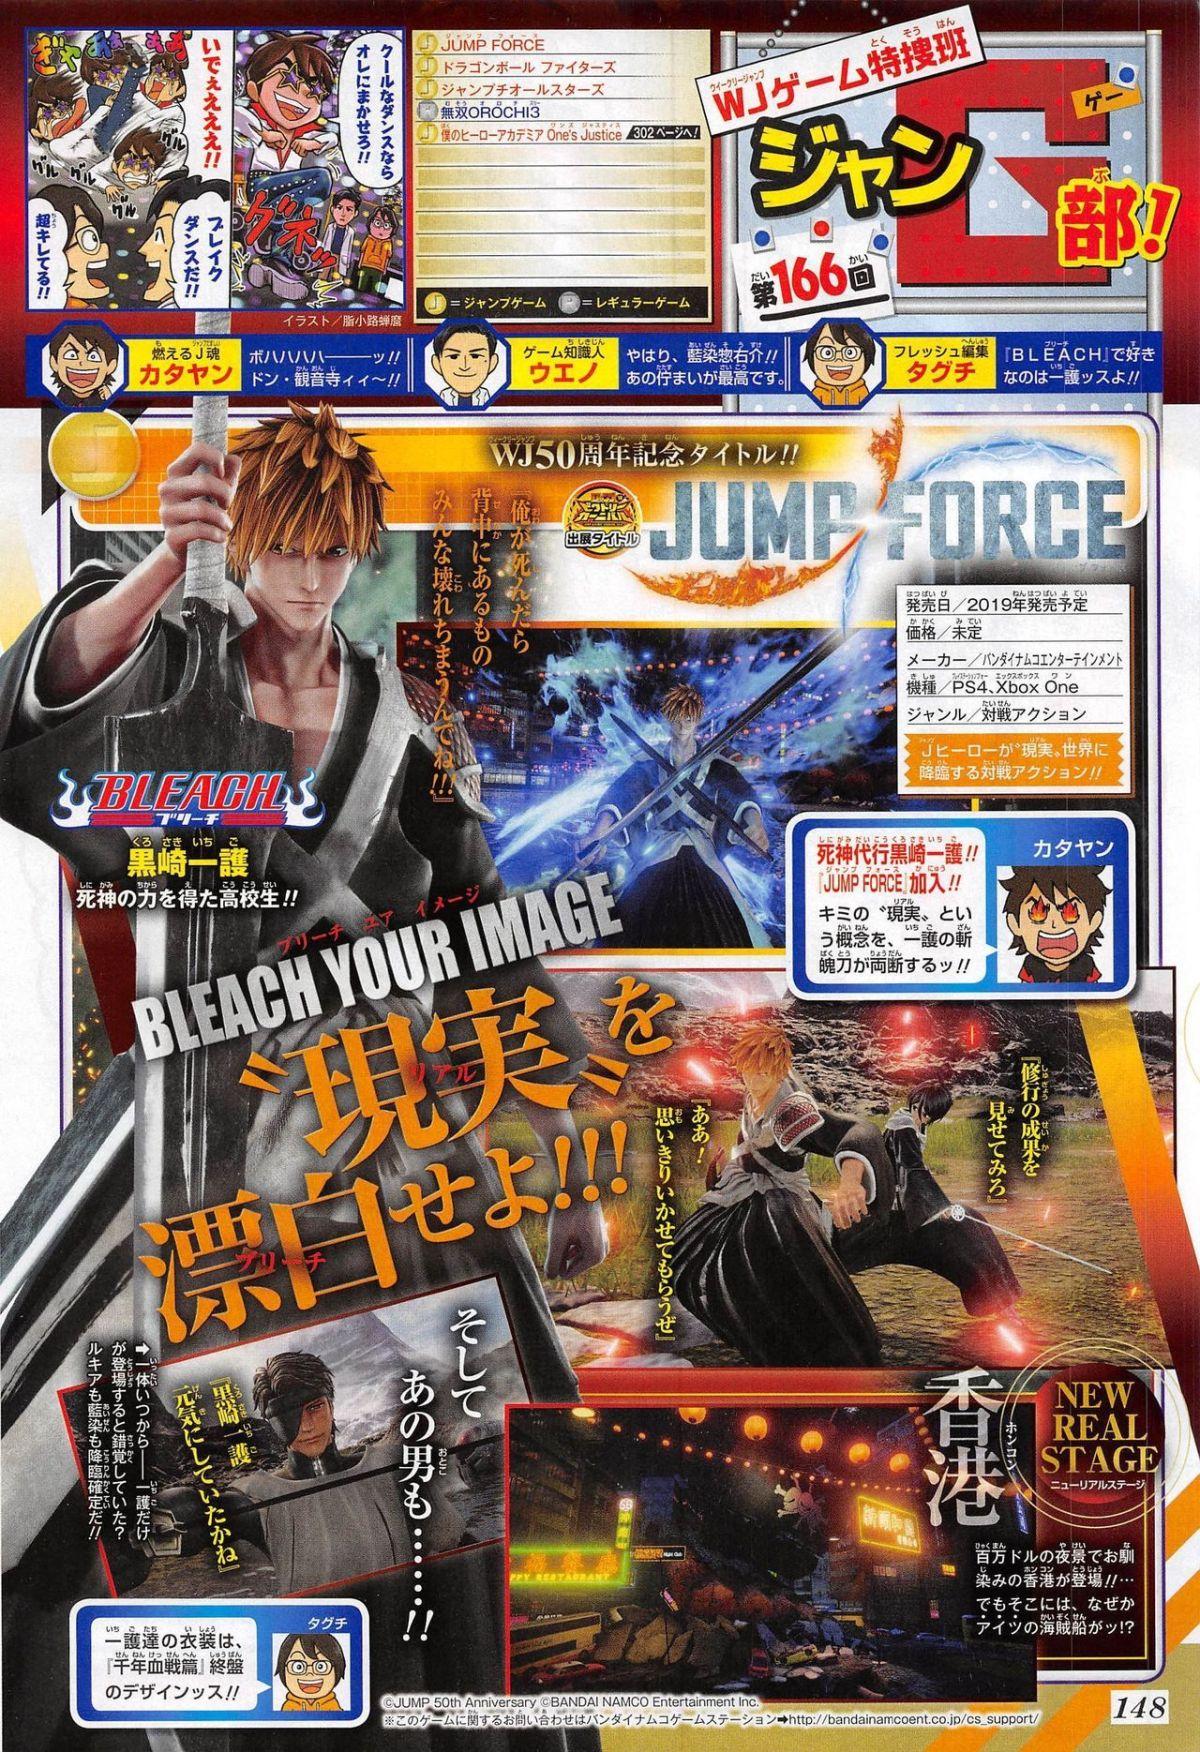 ichigo-kurosaki-de-bleach-llegara-a-jump-force-frikigamers.com